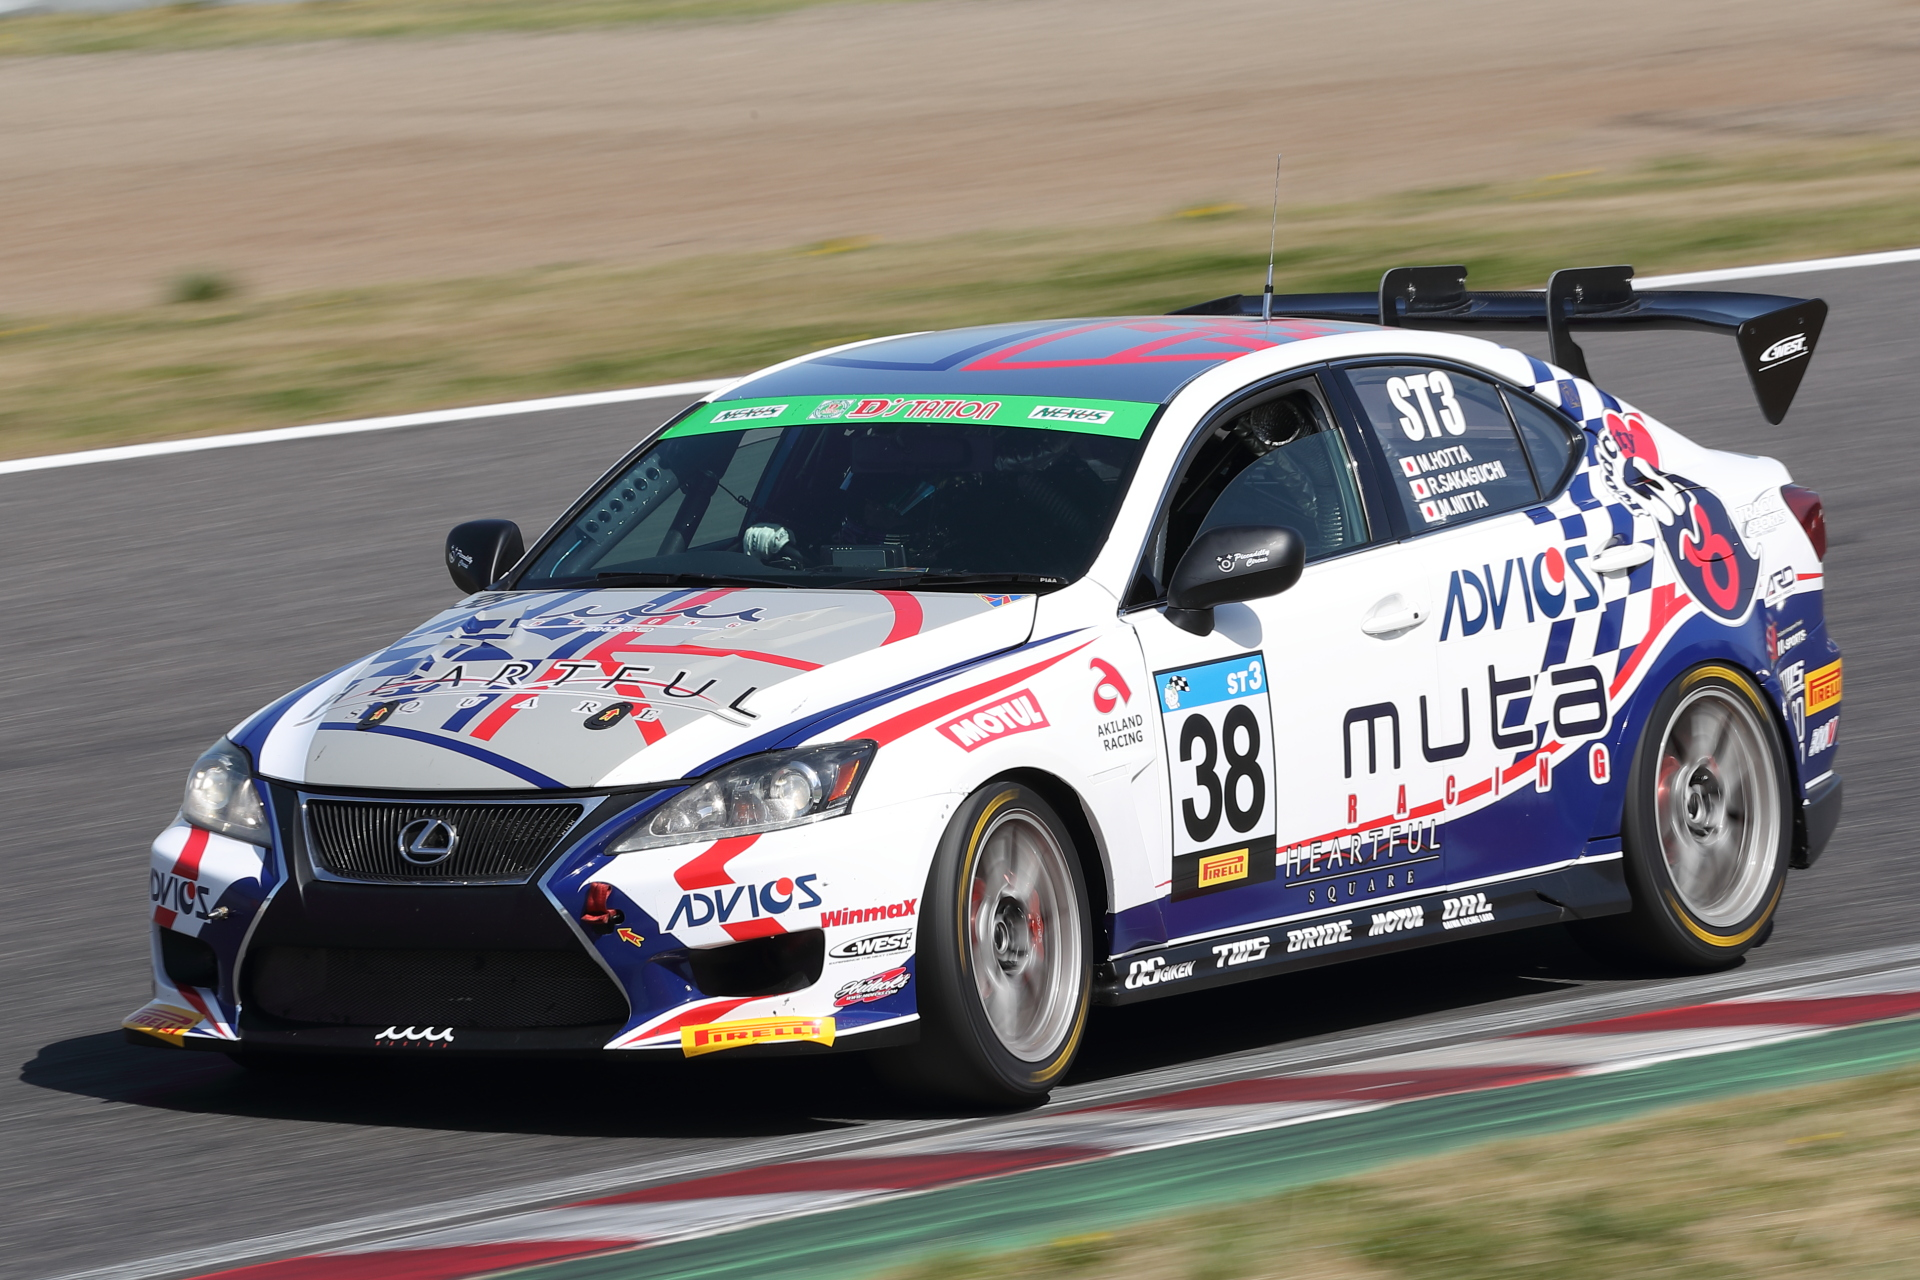 1位 No.38 muta Racing ADVICS IS350 TWS(GSE21)堀田誠/阪口良平